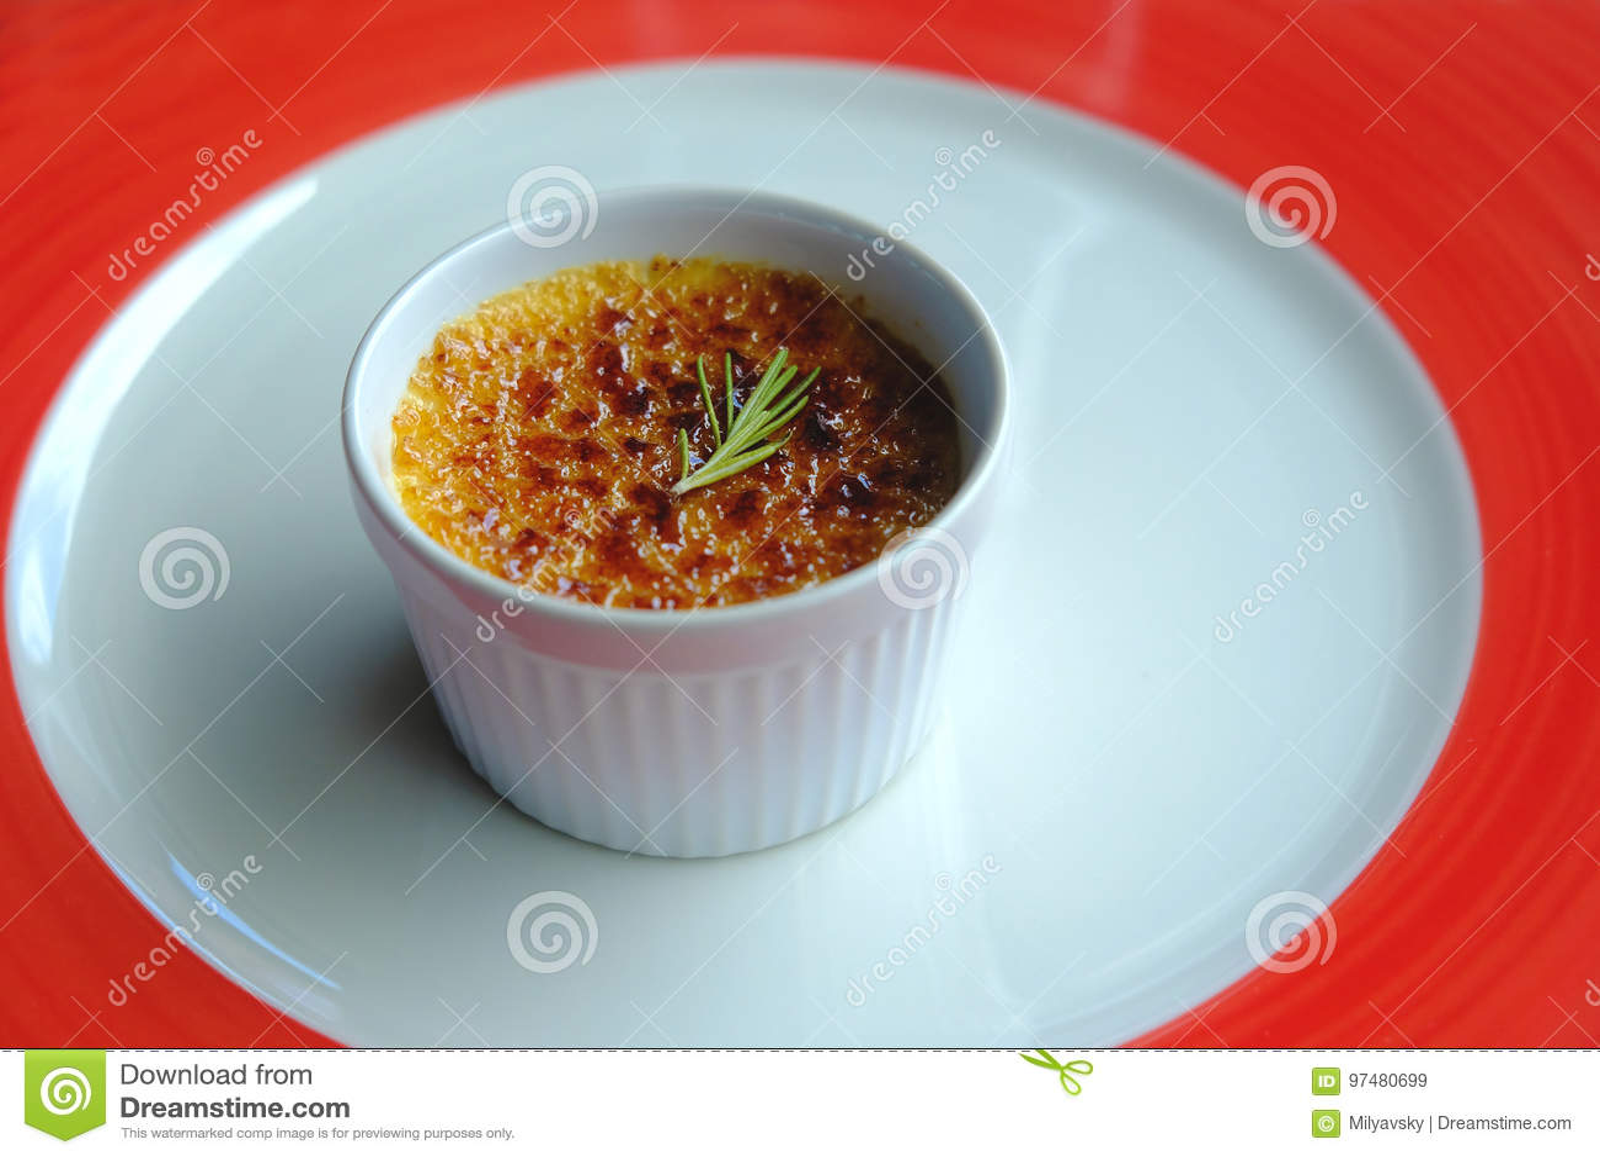 Crème-brulée, dessert francese